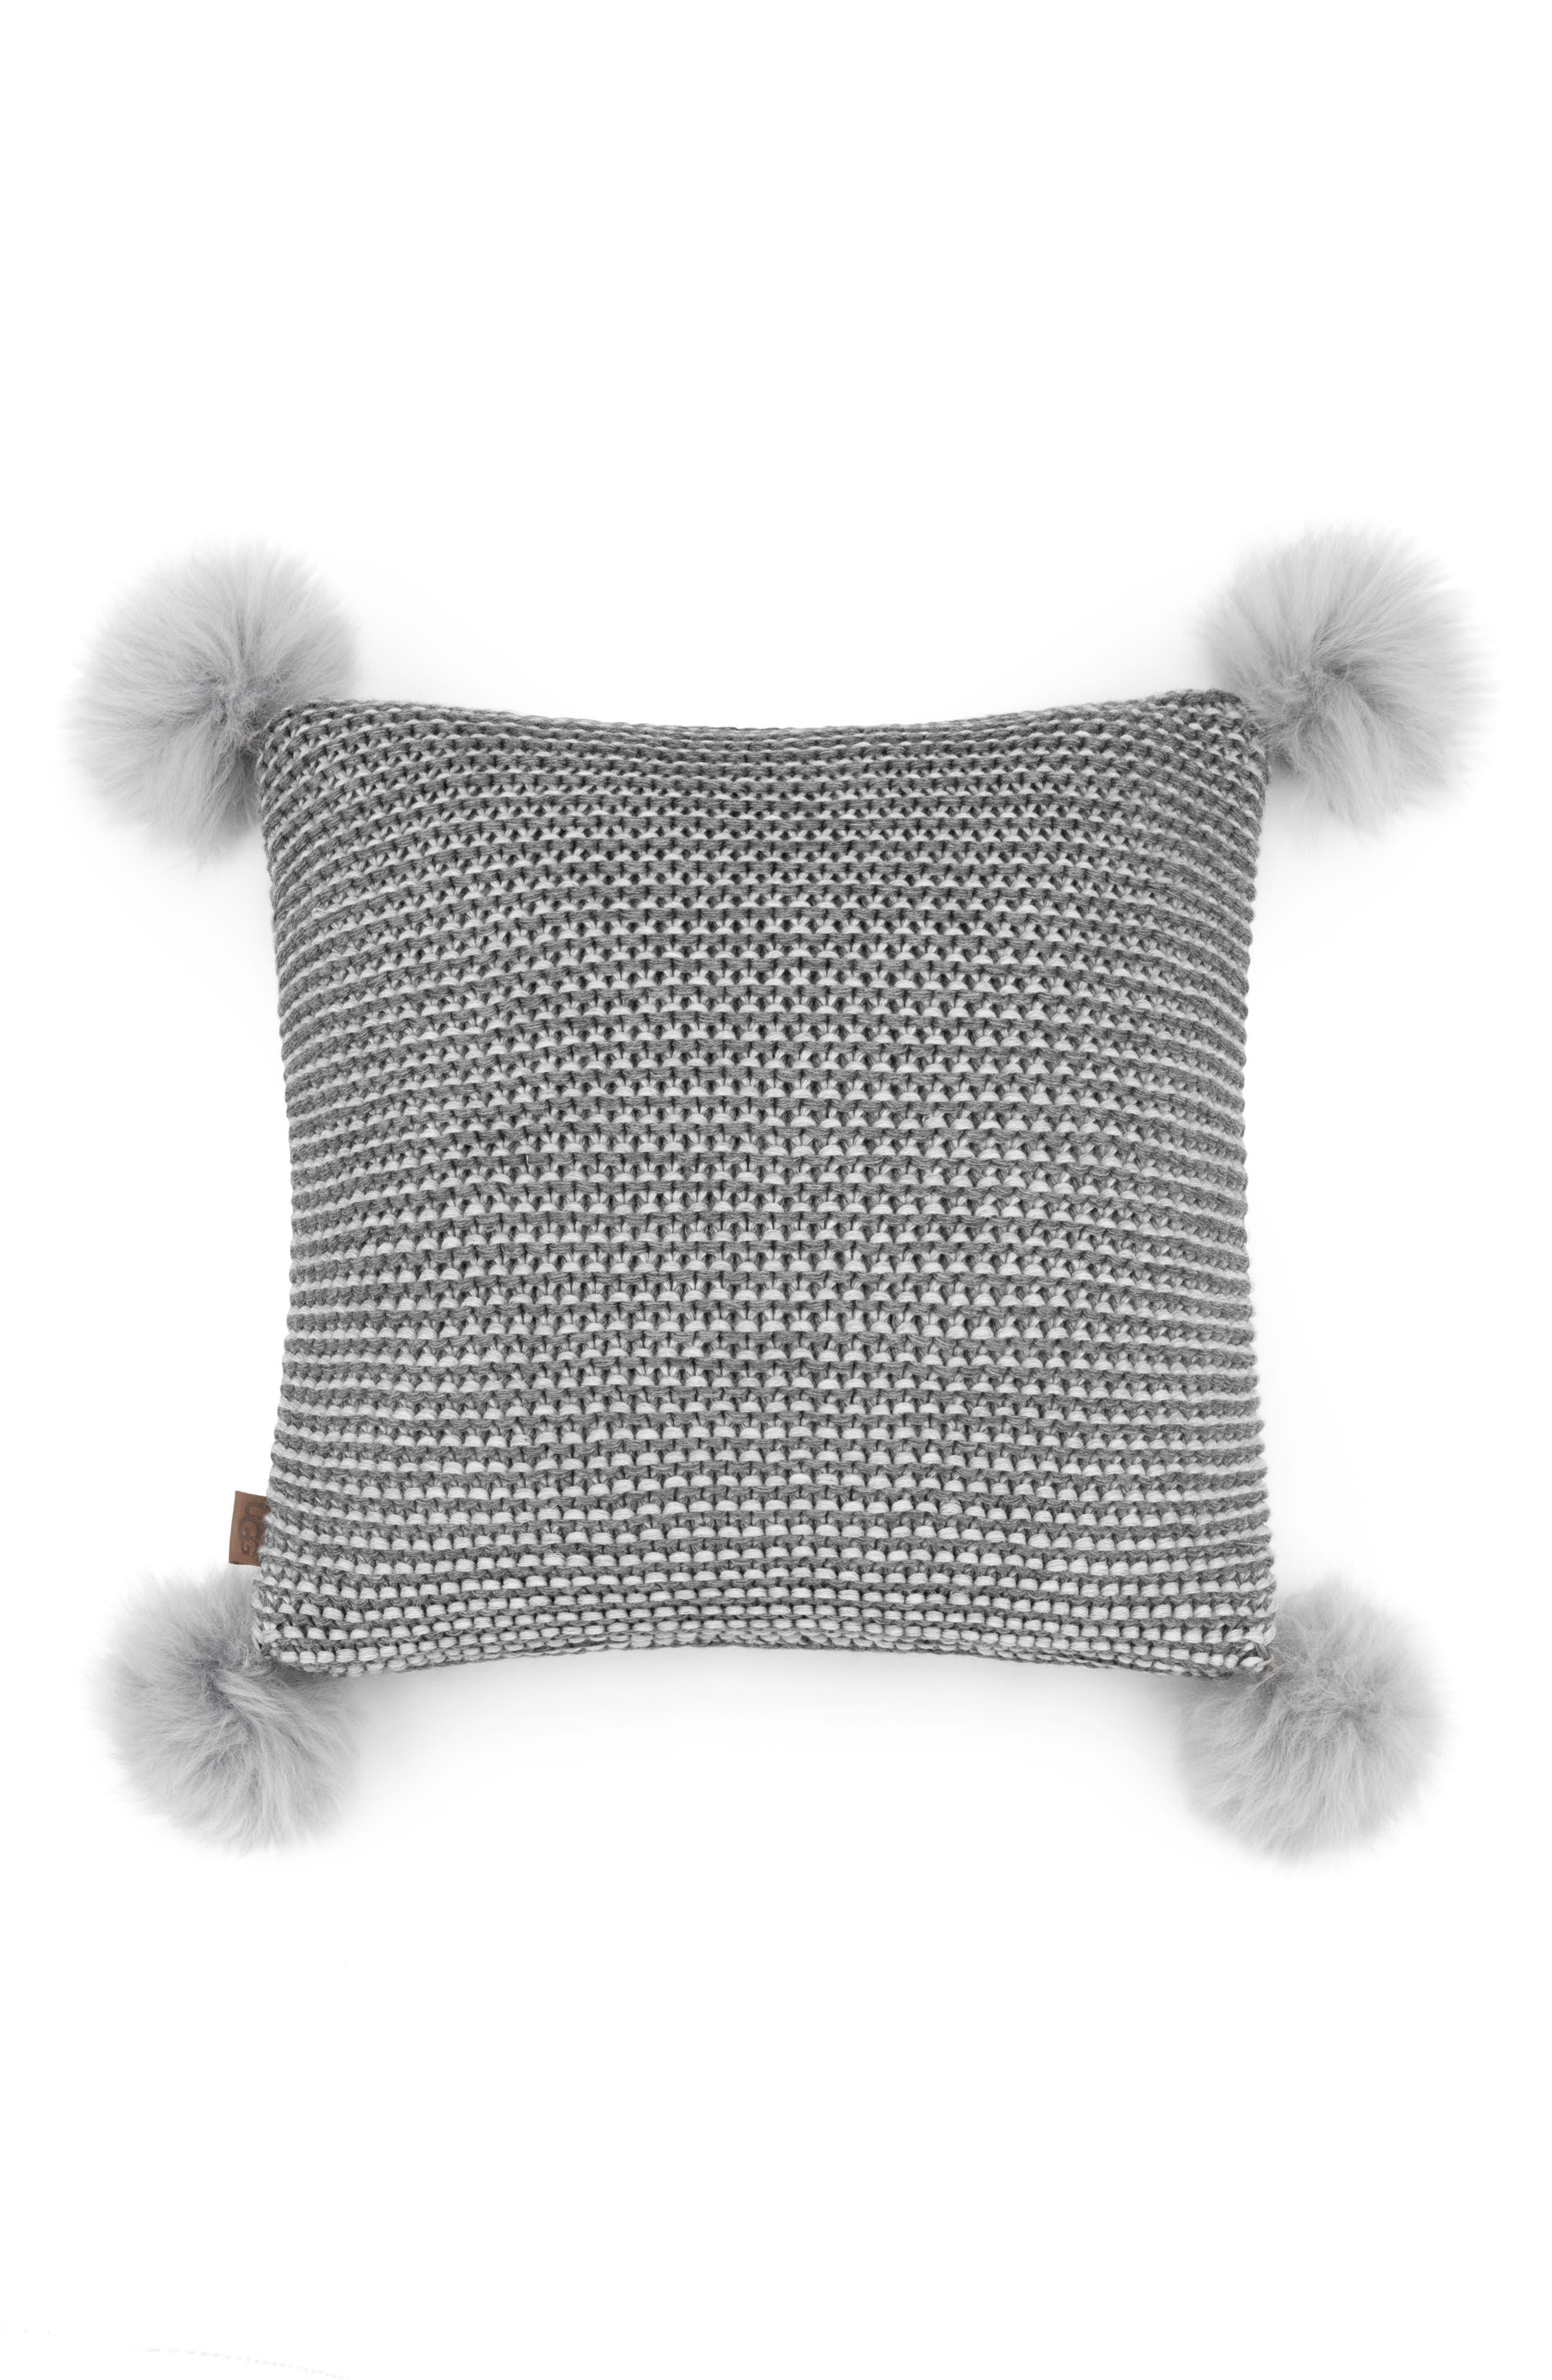 Snow Creek Genuine Shearling Pillow,                             Main thumbnail 1, color,                             Stone/ Seal